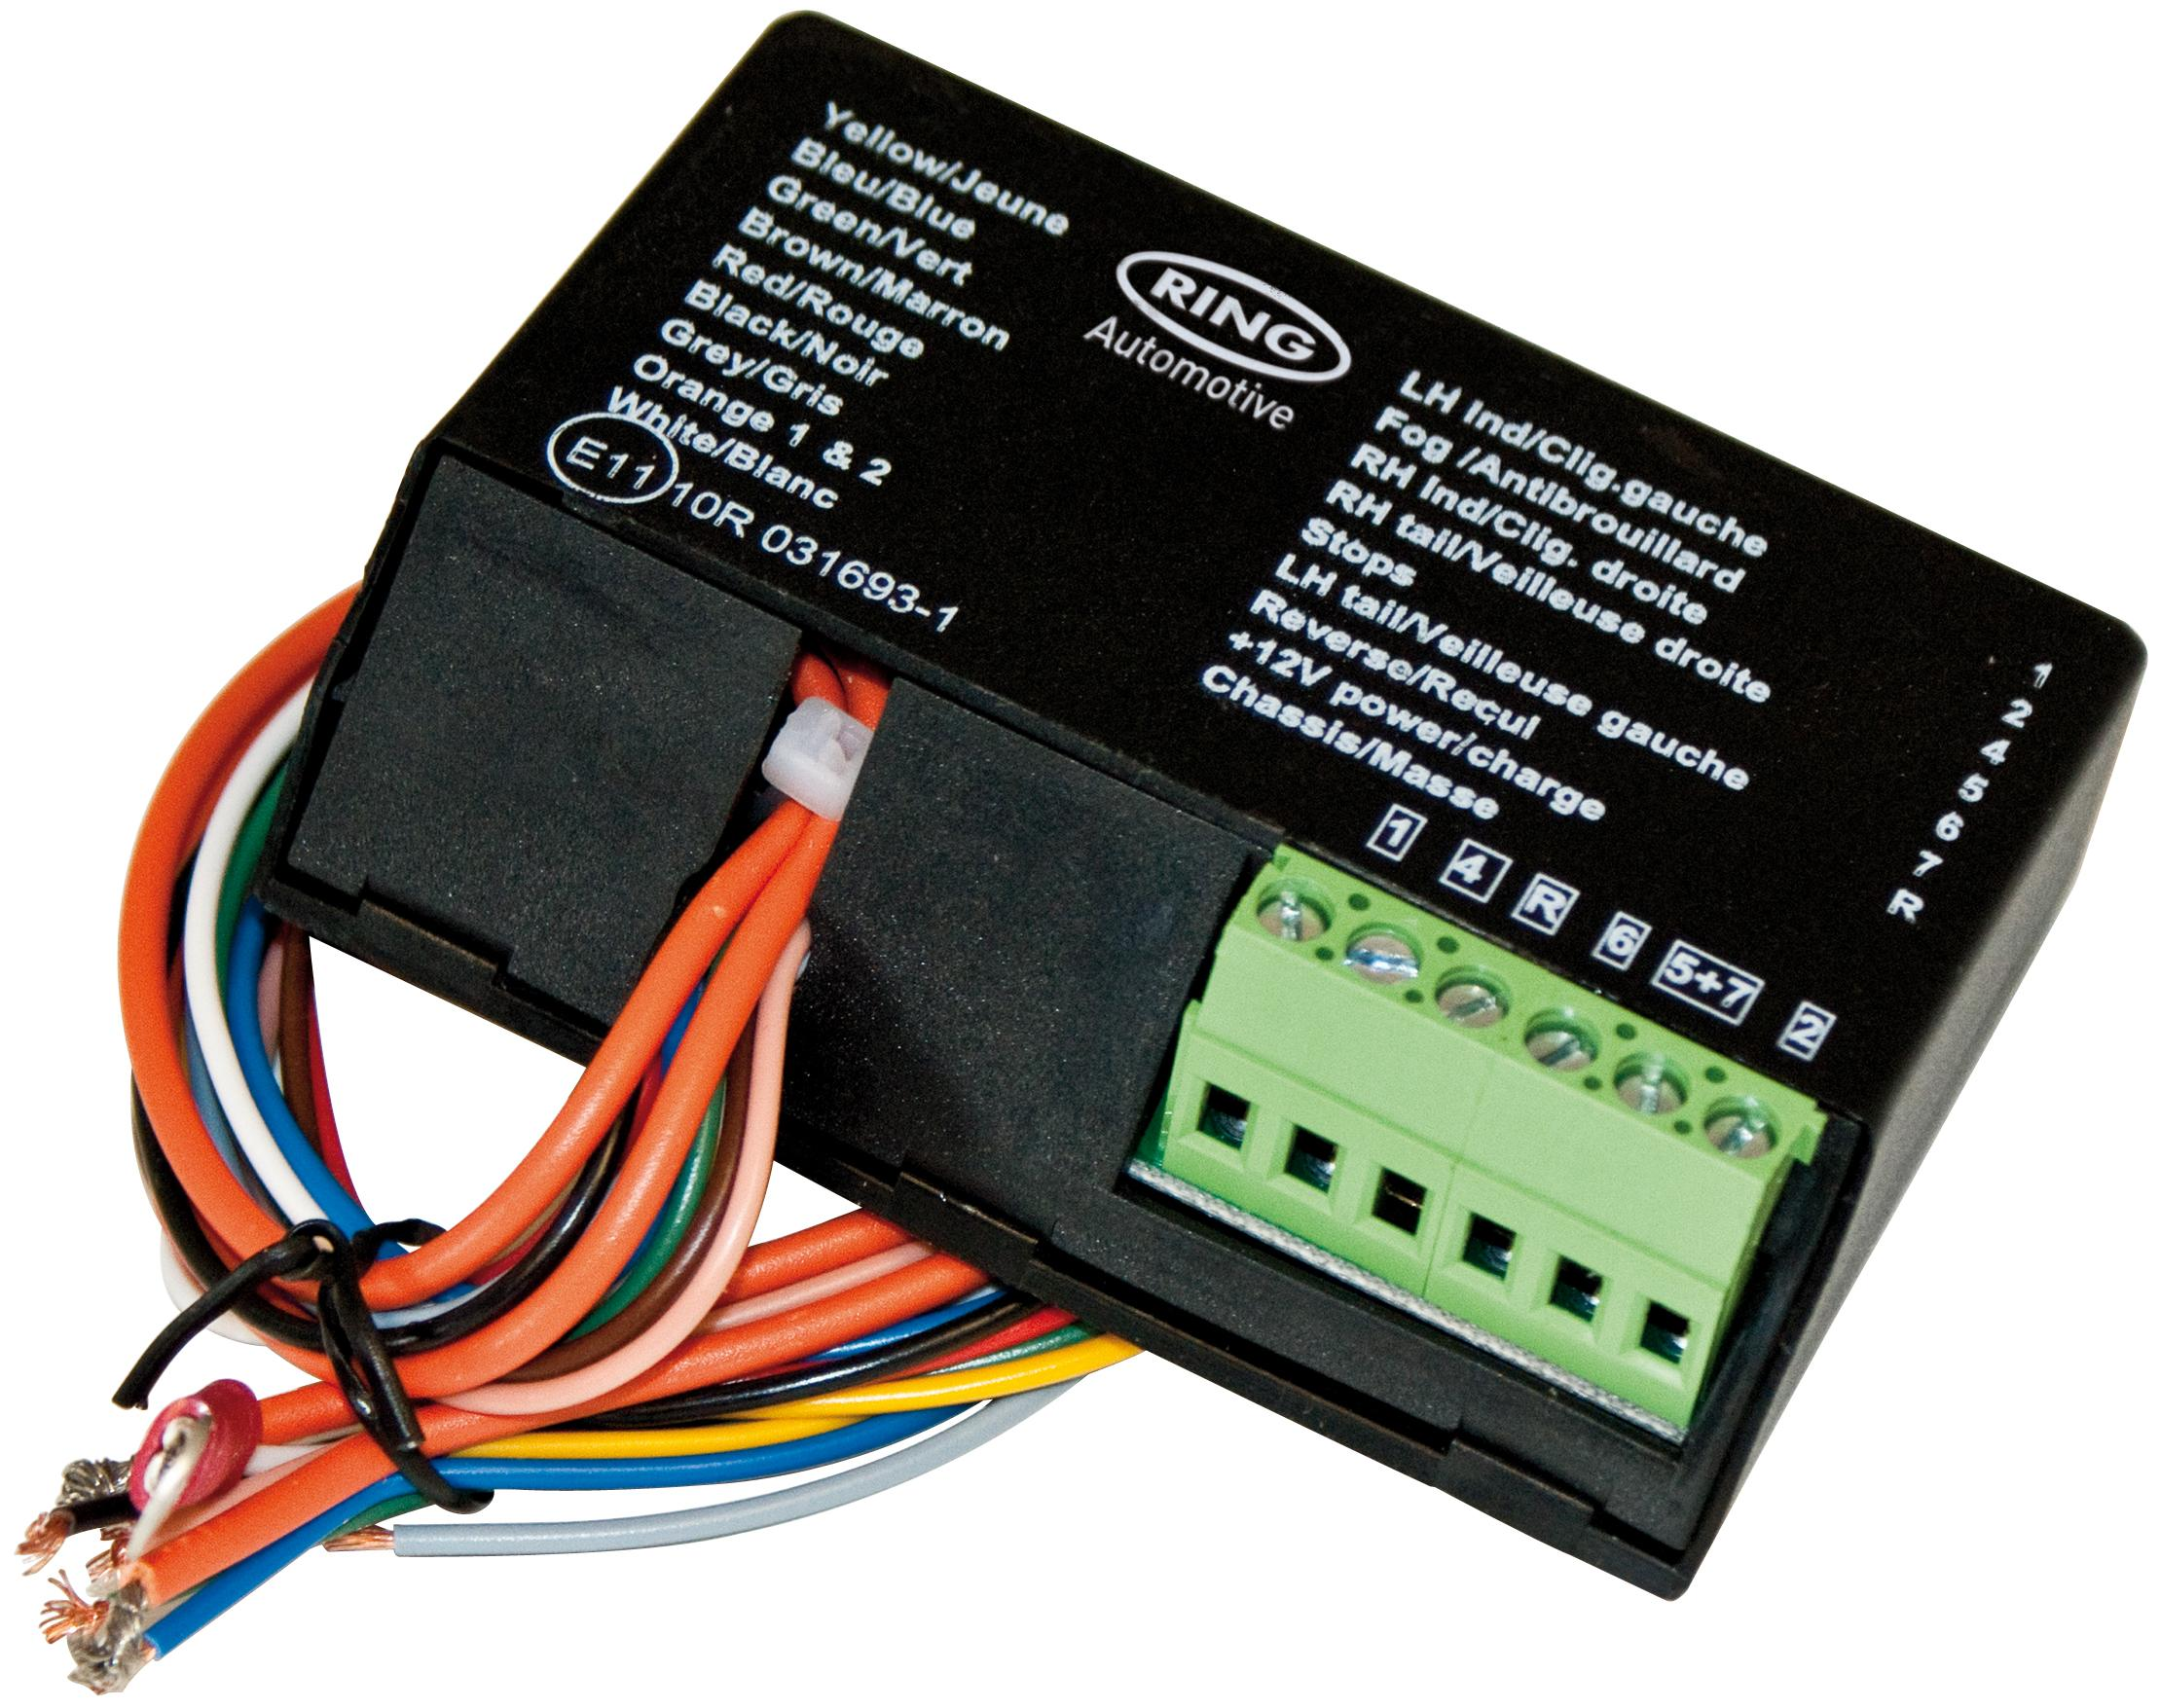 Towbar 7 Pin wiring kit Socket plug TEB7AS wires Bypass Relay fitting kit